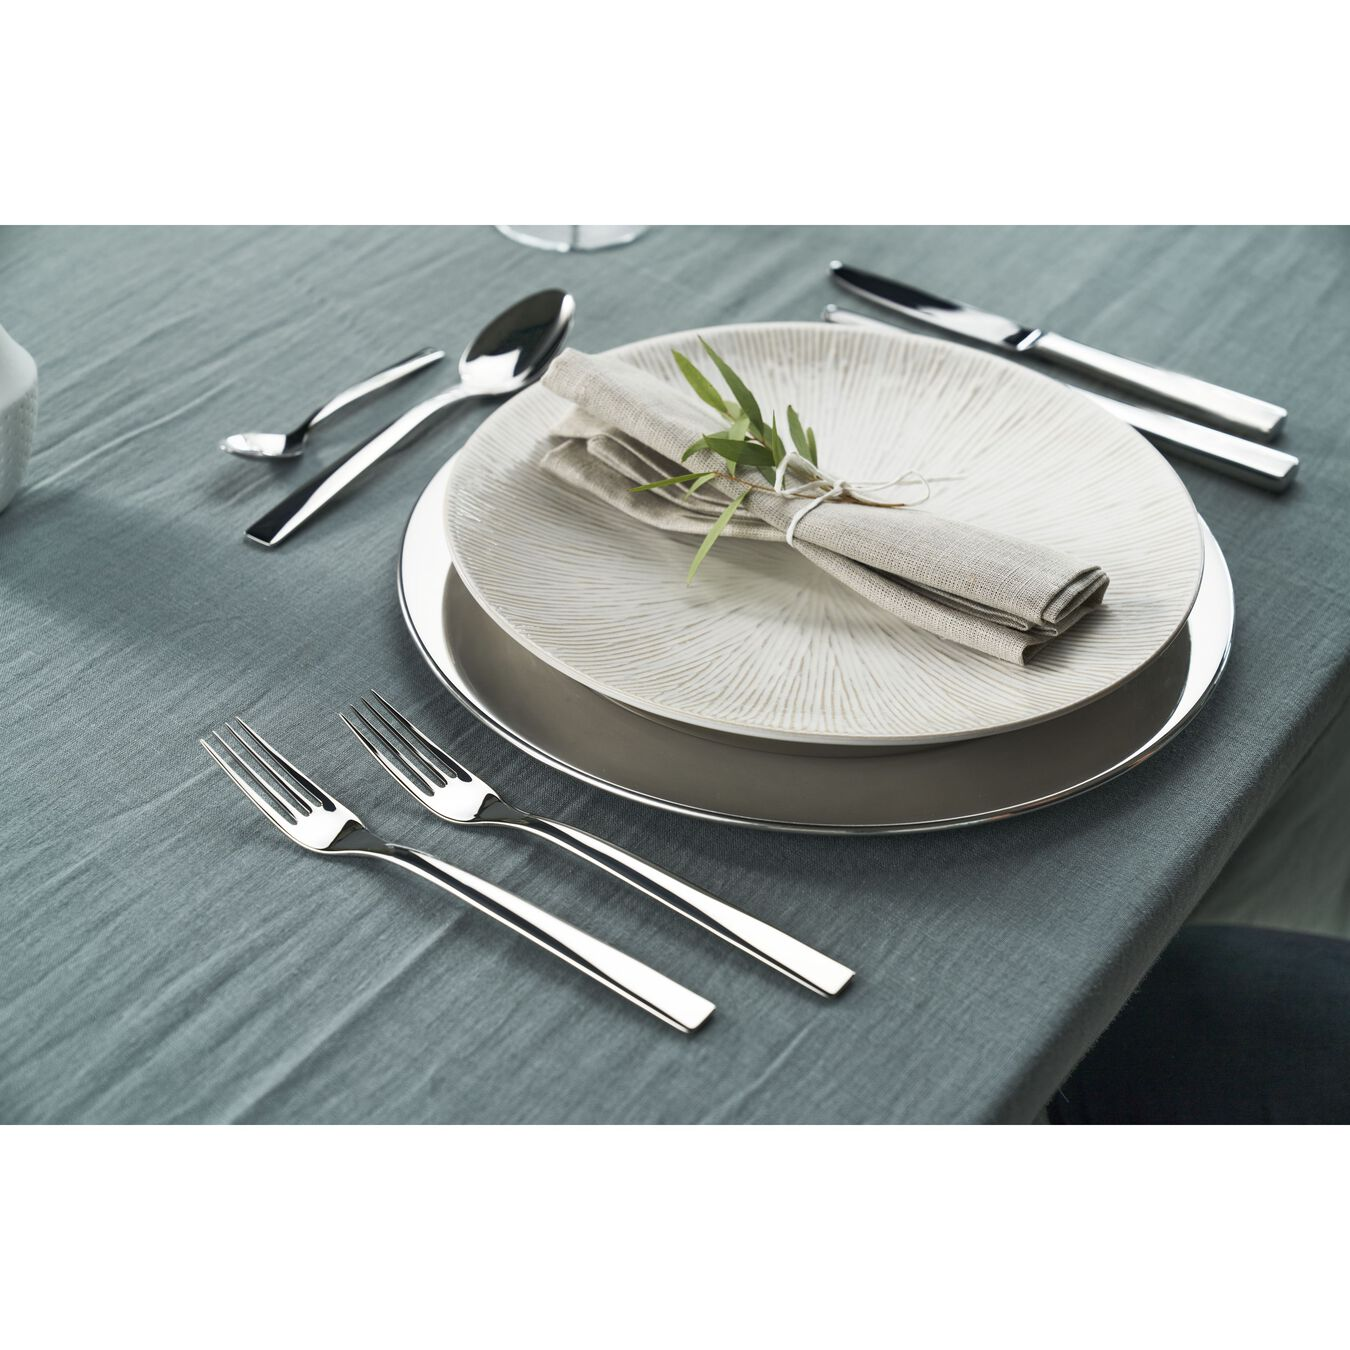 Çatal Kaşık Bıçak Seti | Parlak | 68-parça,,large 2